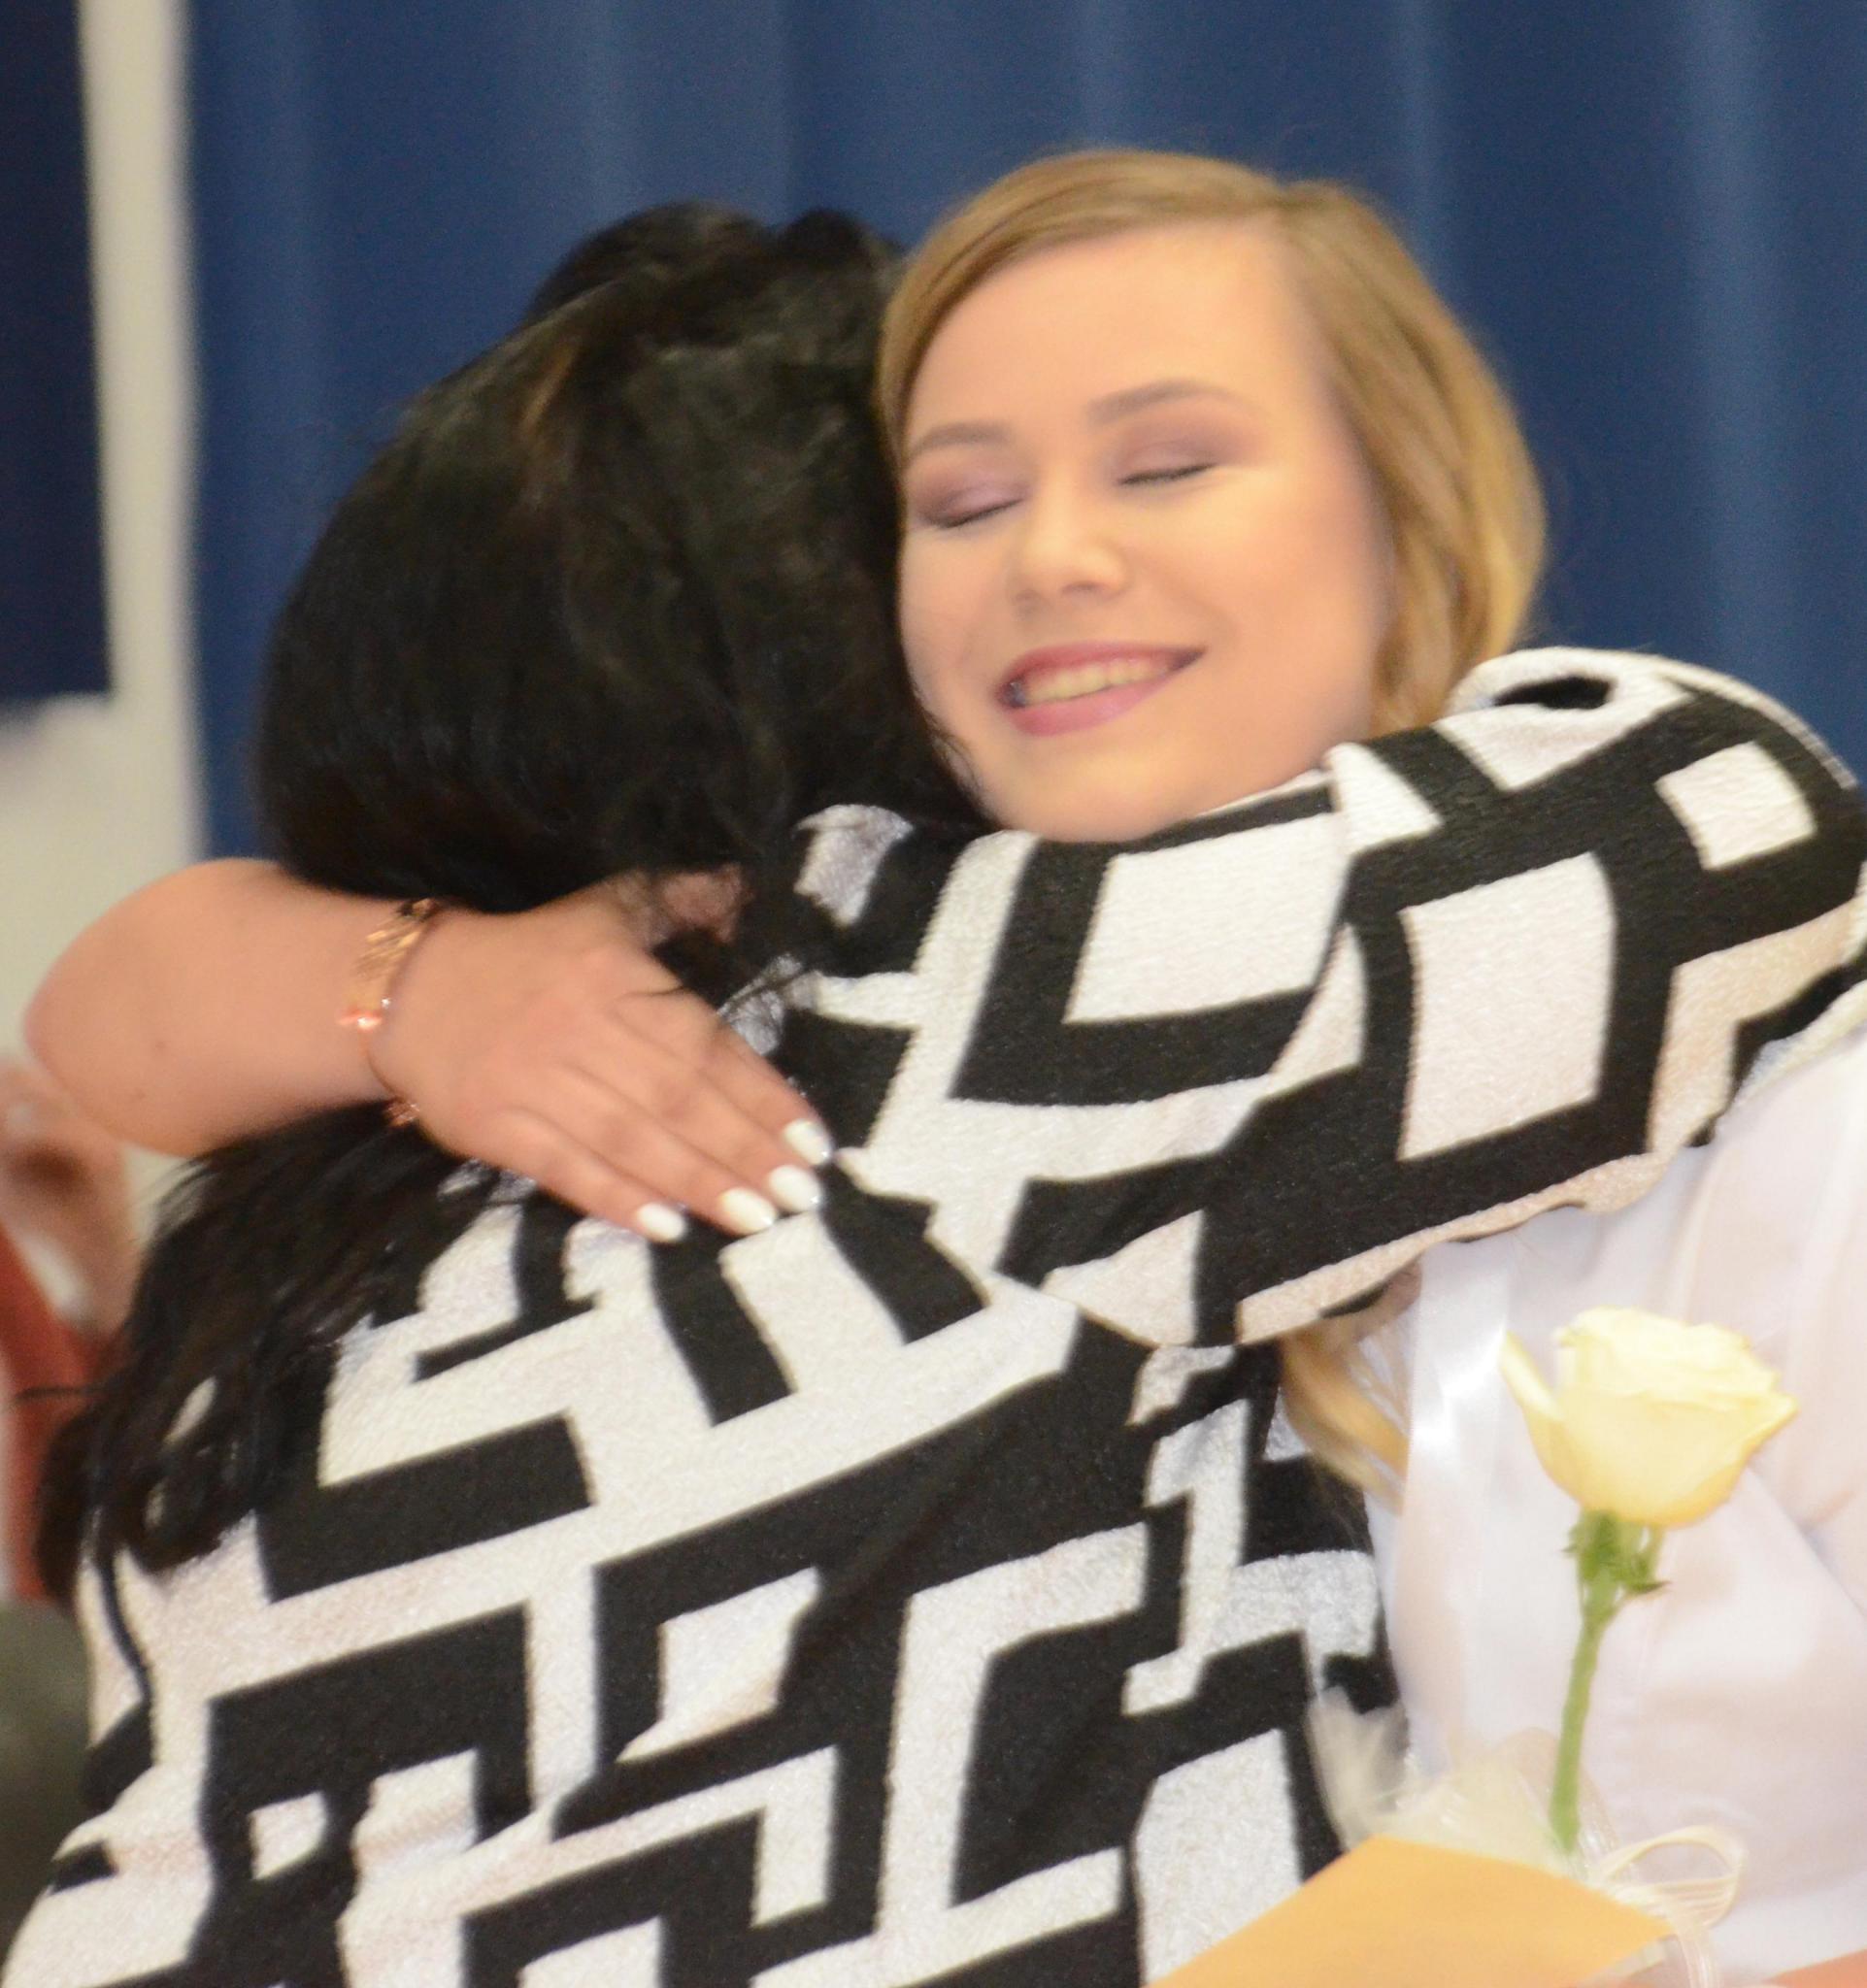 Sharon Sahlfeld photo Meghan Augustine receives a hug from North Central Kansas Technical College Nursing Director, Sandy Gottschalk after receiving her pin during graduation ceremonies, held on Friday at the Beloit Jr/Sr High School.